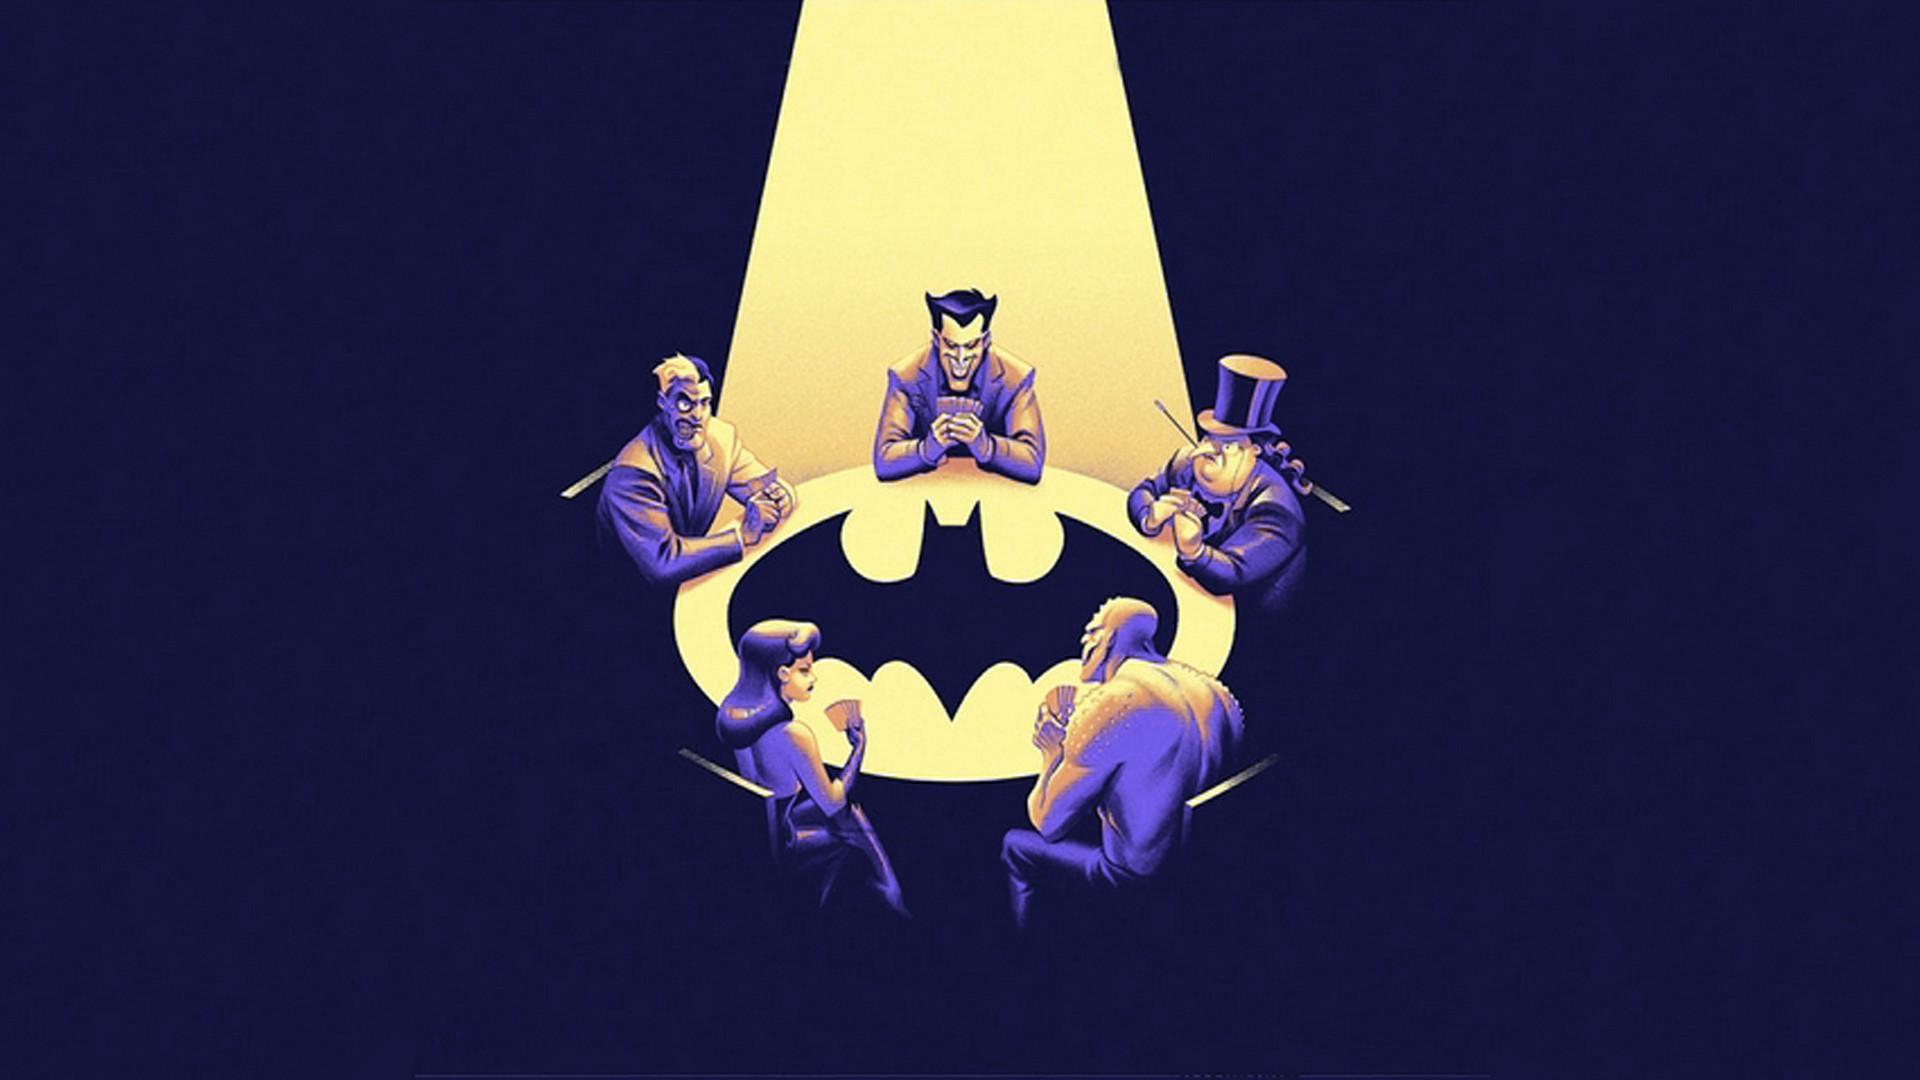 1920x1080 Px Batman Joker Killer Croc Poison Ivy Two Face